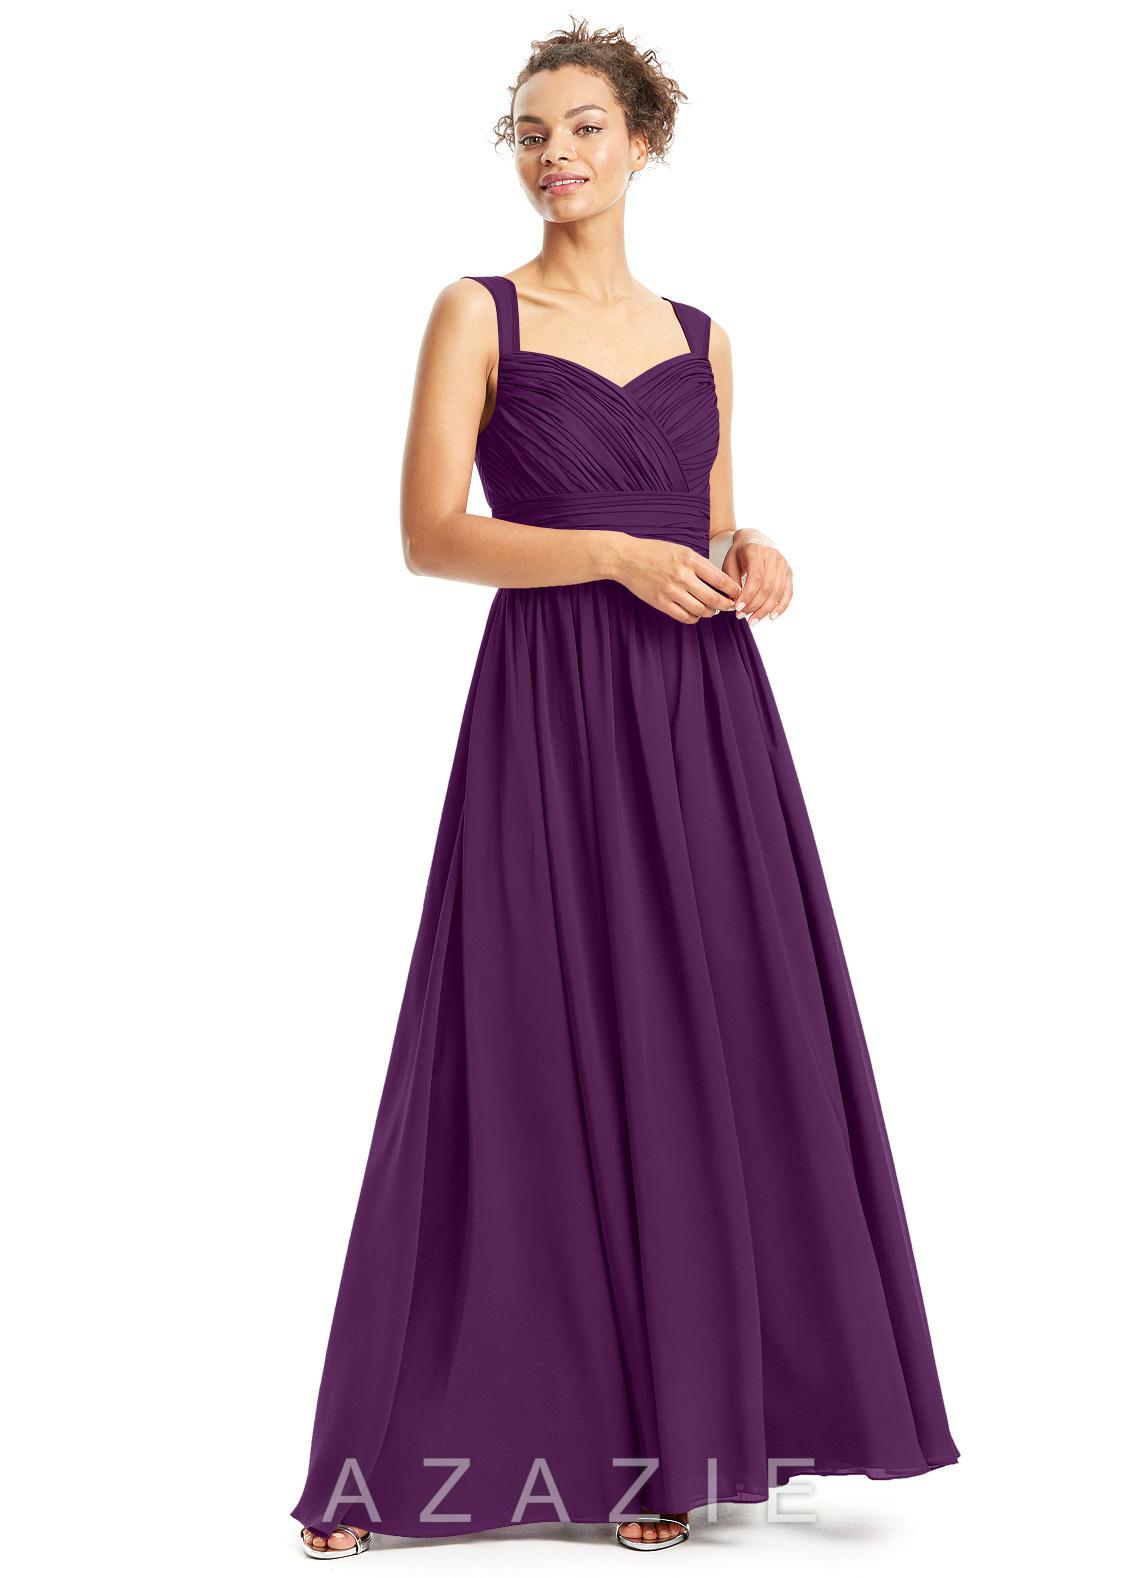 Azazie Dara Bridesmaid Dress | Azazie